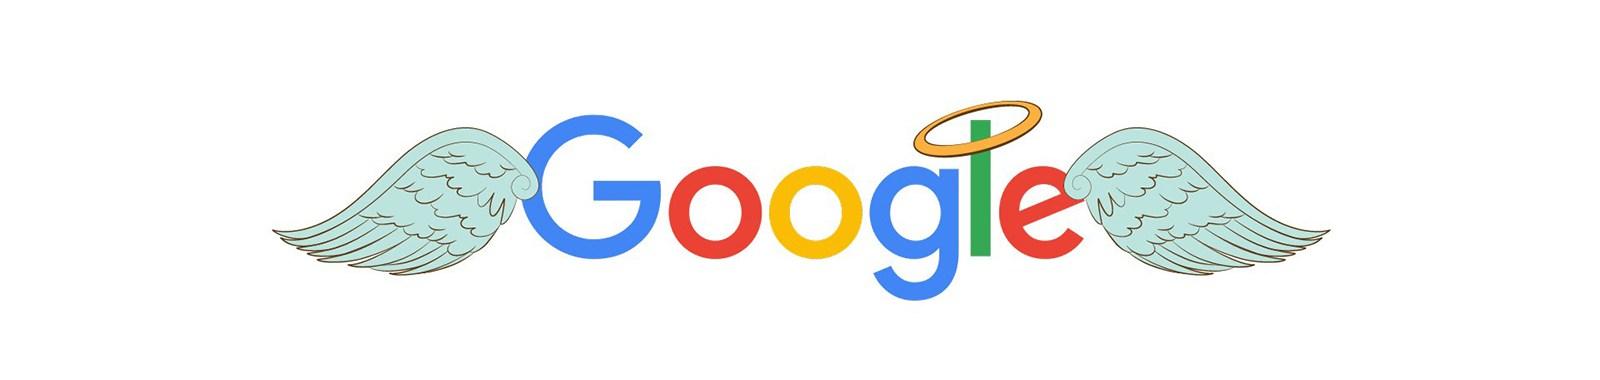 google-angel-eye